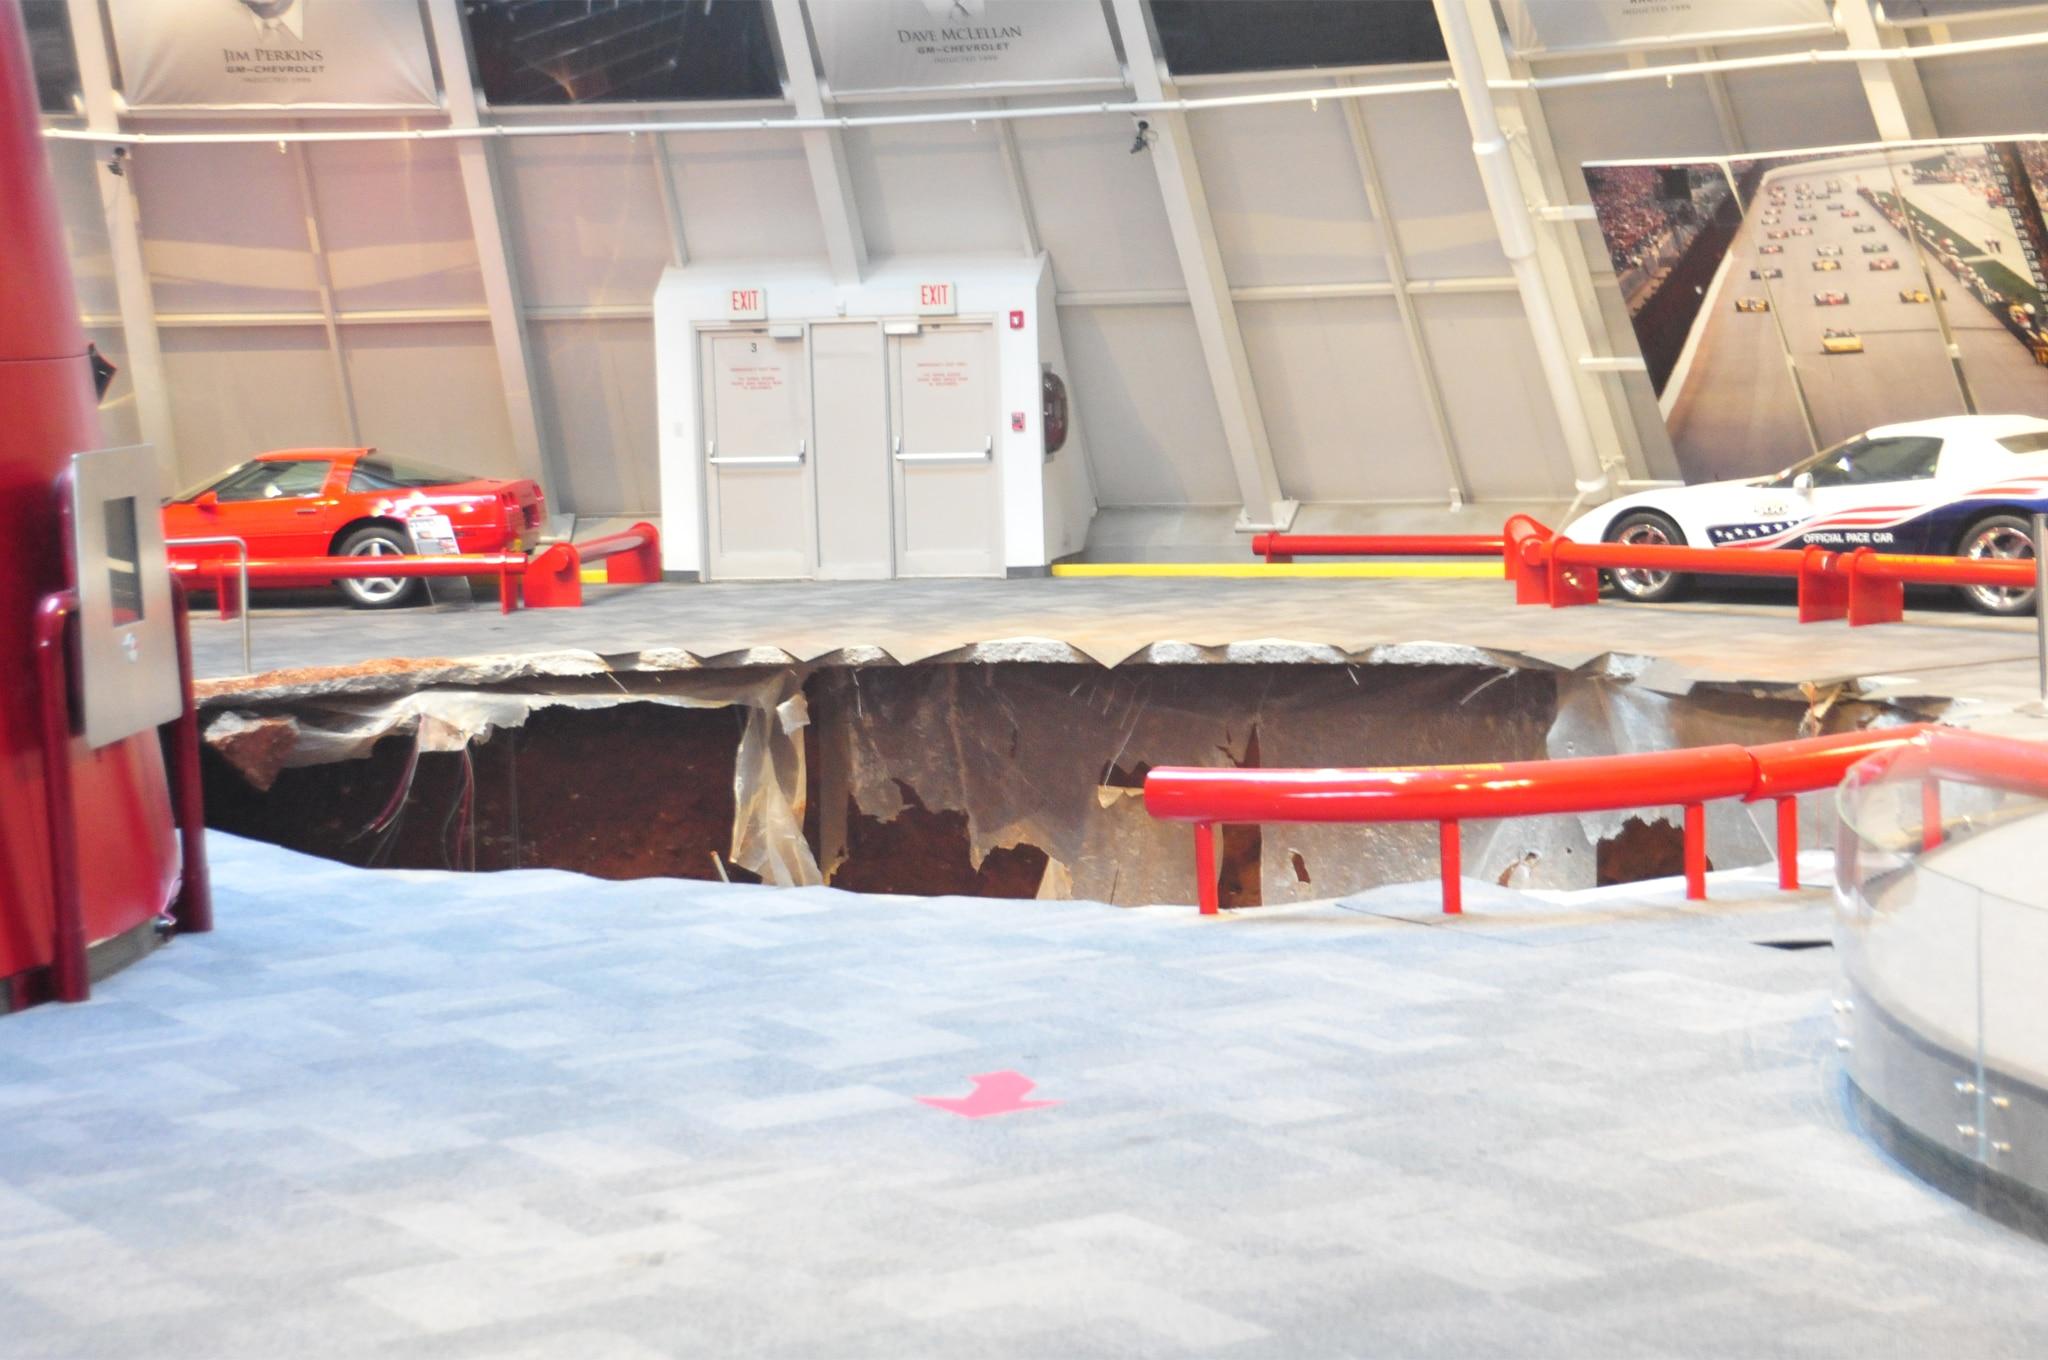 National Corvette Museum >> Eight Chevrolet Corvettes Fall Into Sinkhole At National Corvette Museum - Automobile Magazine